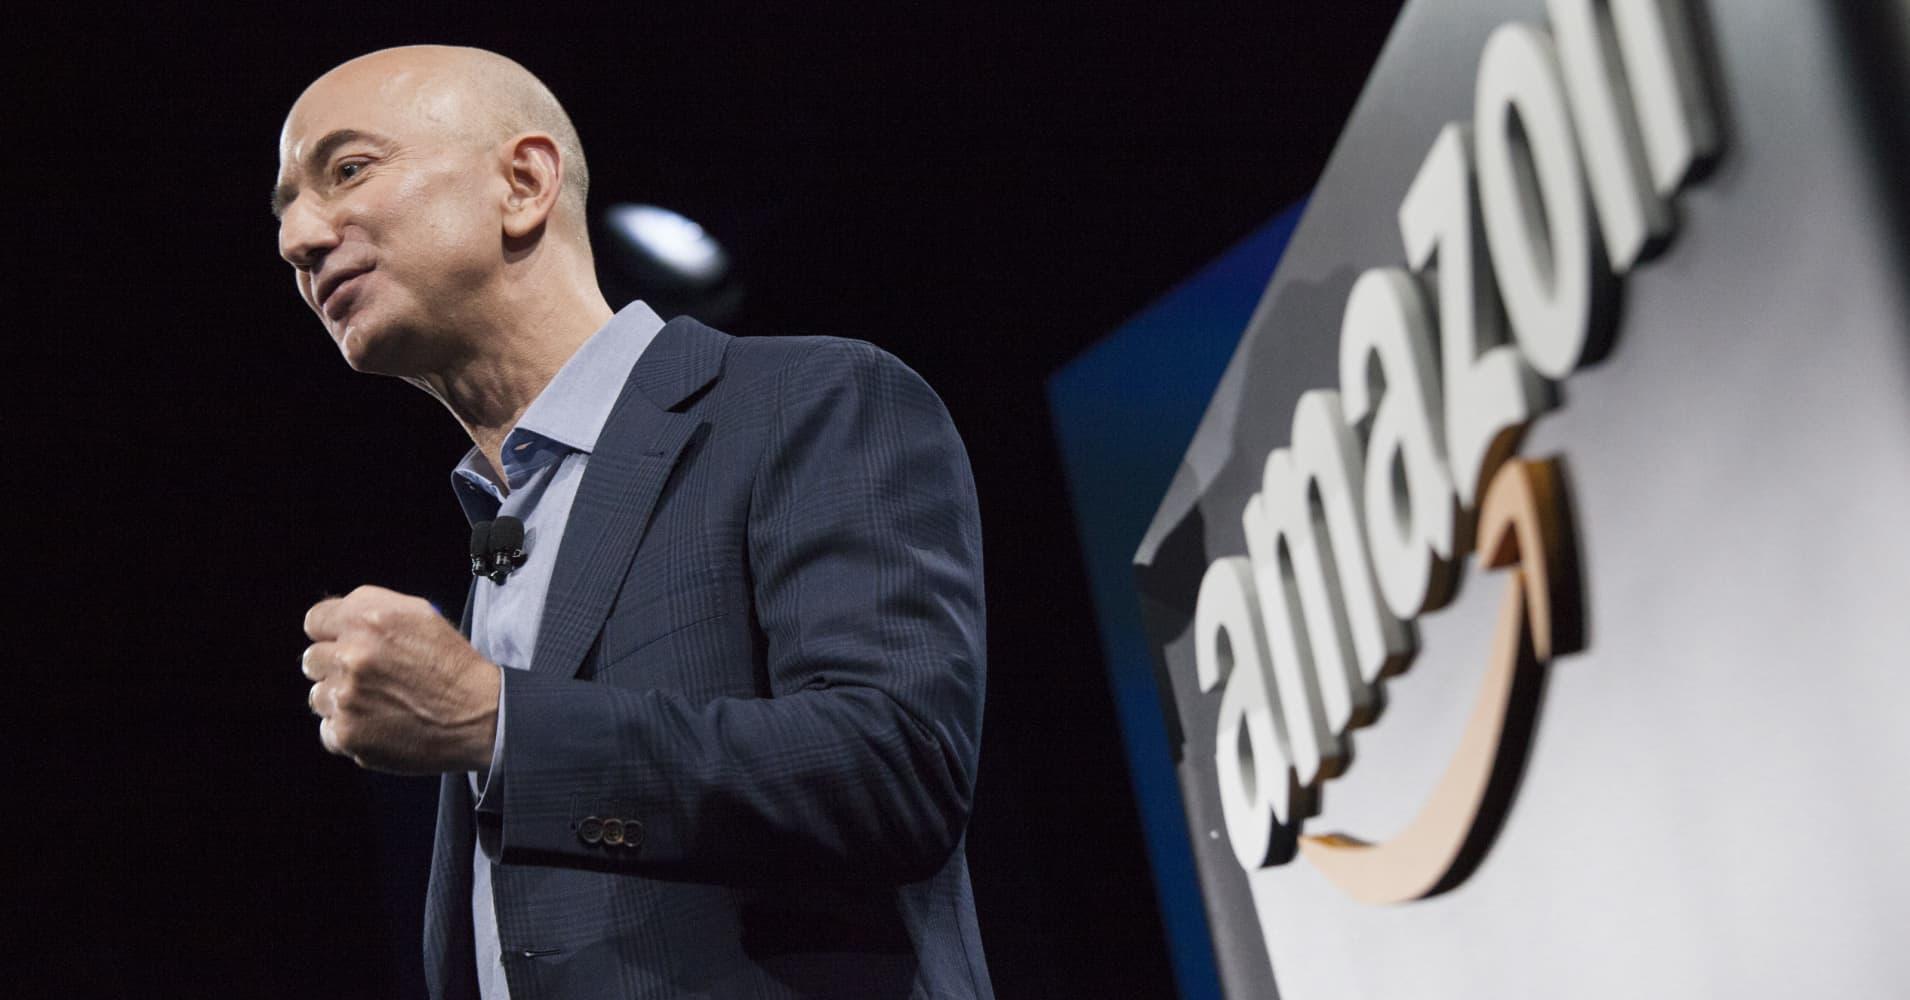 Jeff Bezos, chief executive officer of Amazon.com